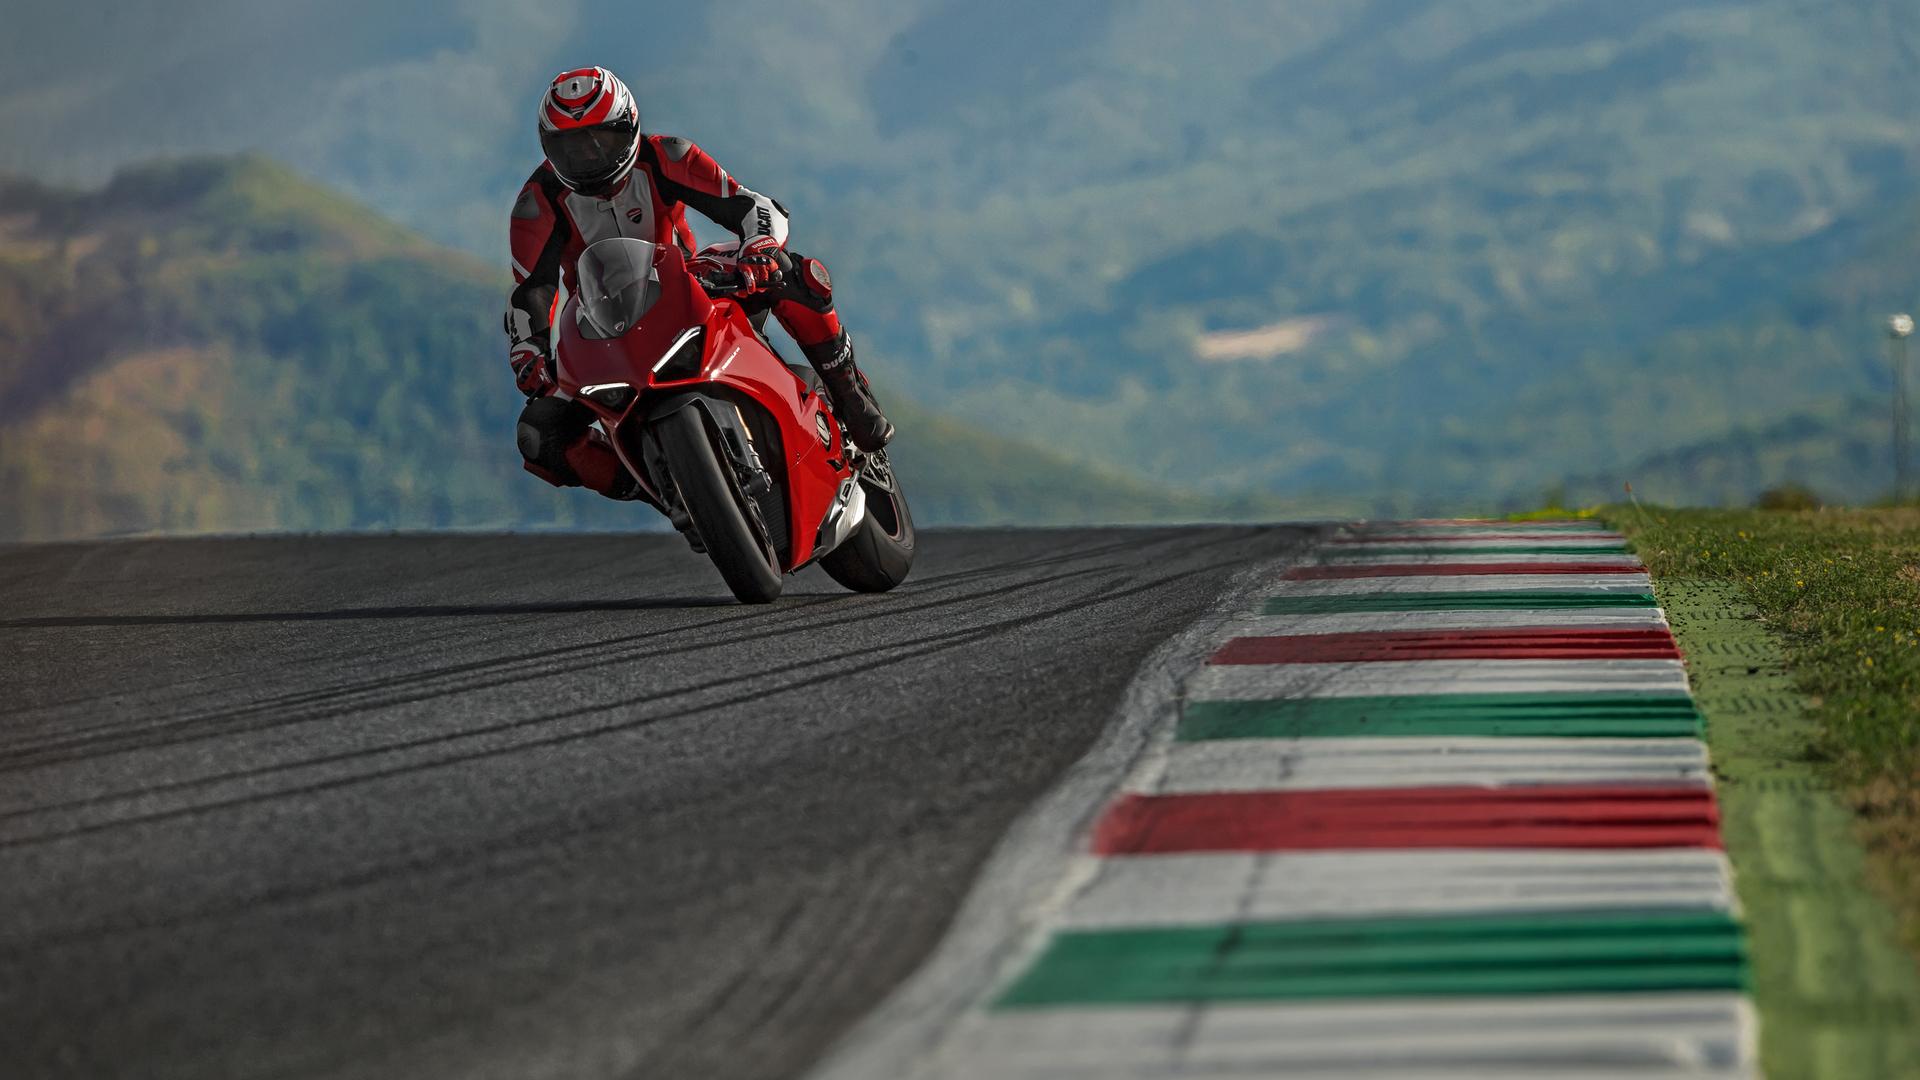 1920x1080 2018 Ducati Panigale V4 4k Laptop Full HD 1080P